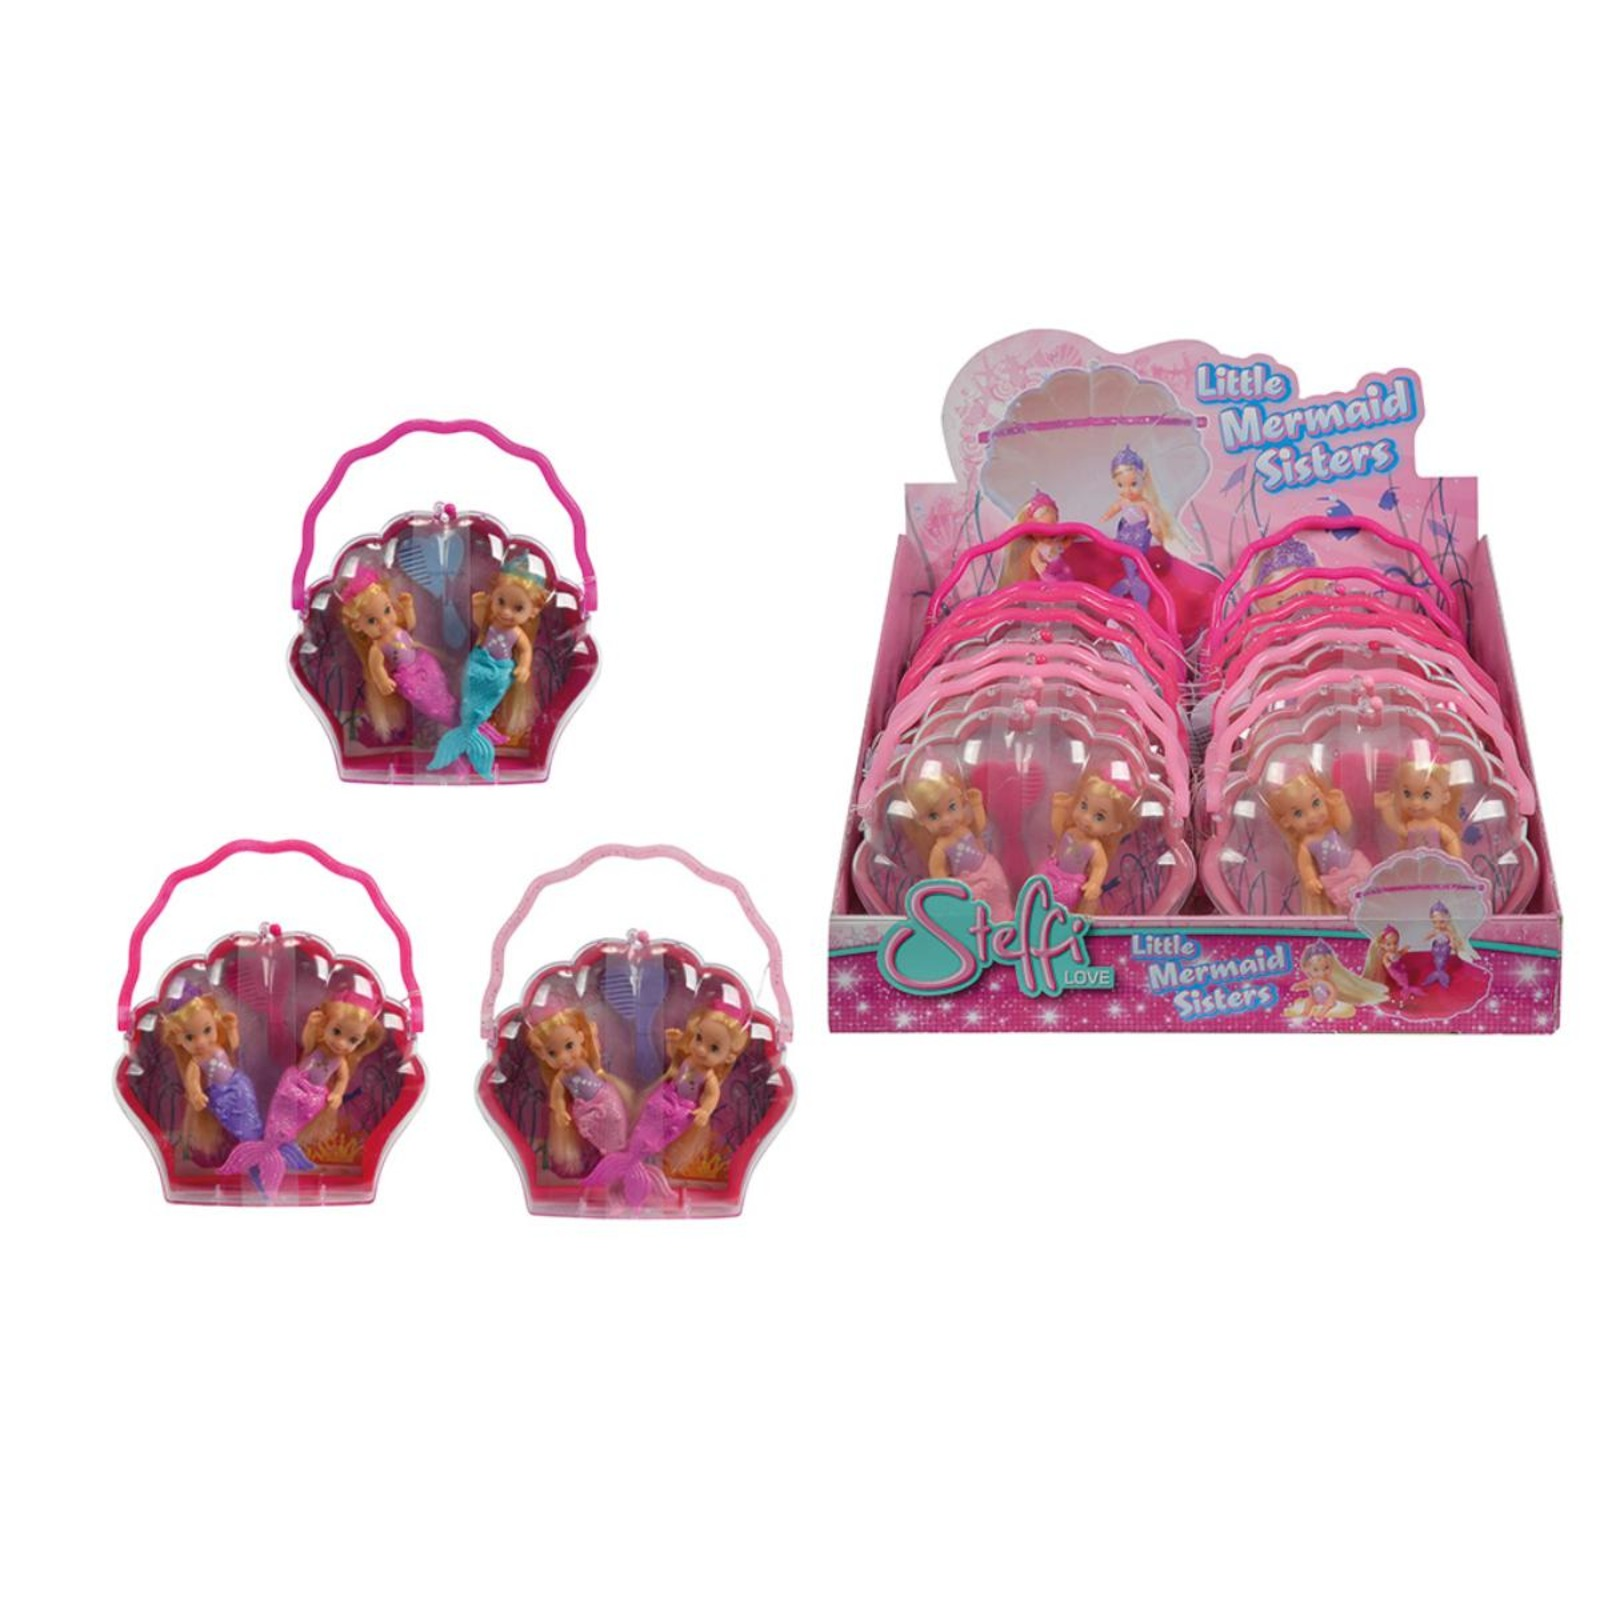 Simba Toys Evi LOVE Little Mermaid Sisters, 3-asst.